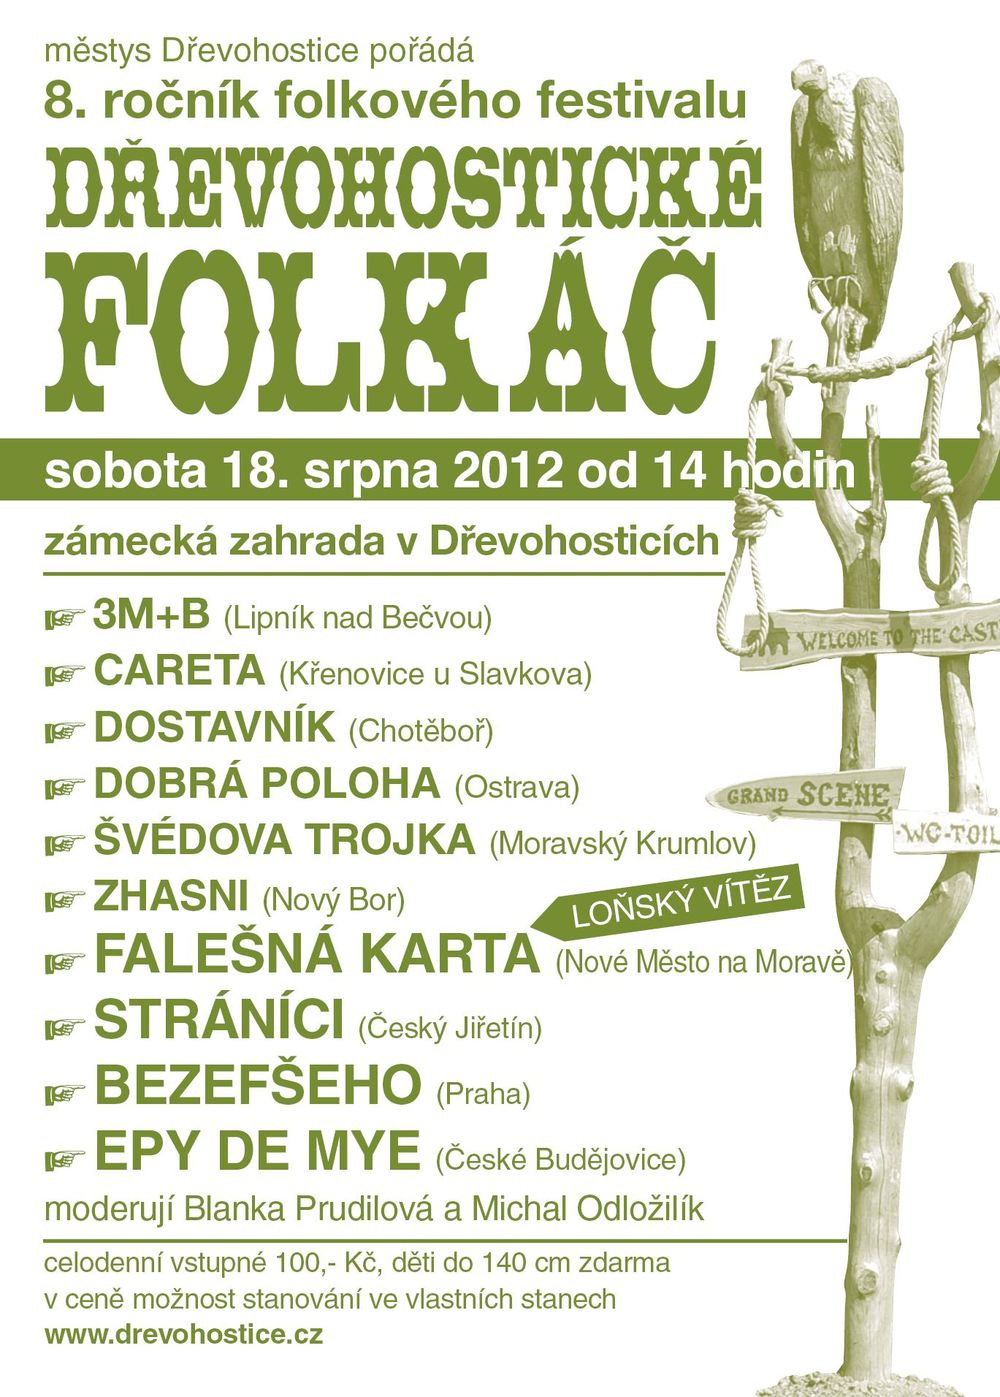 2012_08_18-drevohosticke-folkac-2012-plak